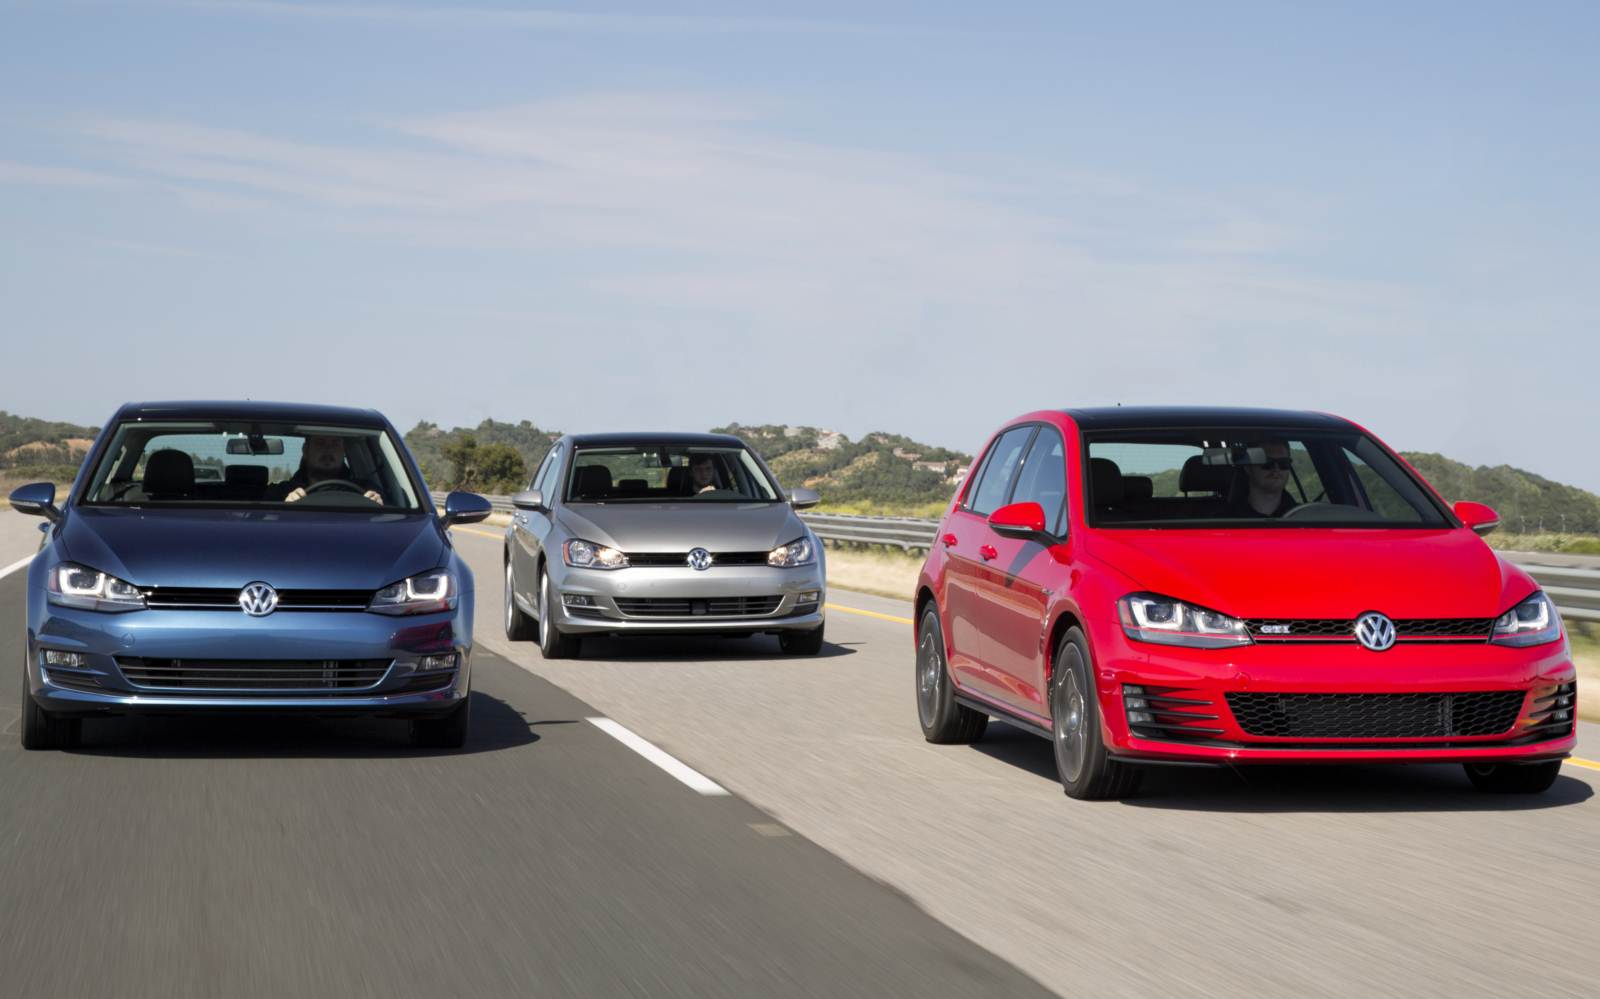 VW Golf e Audi A3, A6, A7, Q5,Q7: recall - risco de incêndio